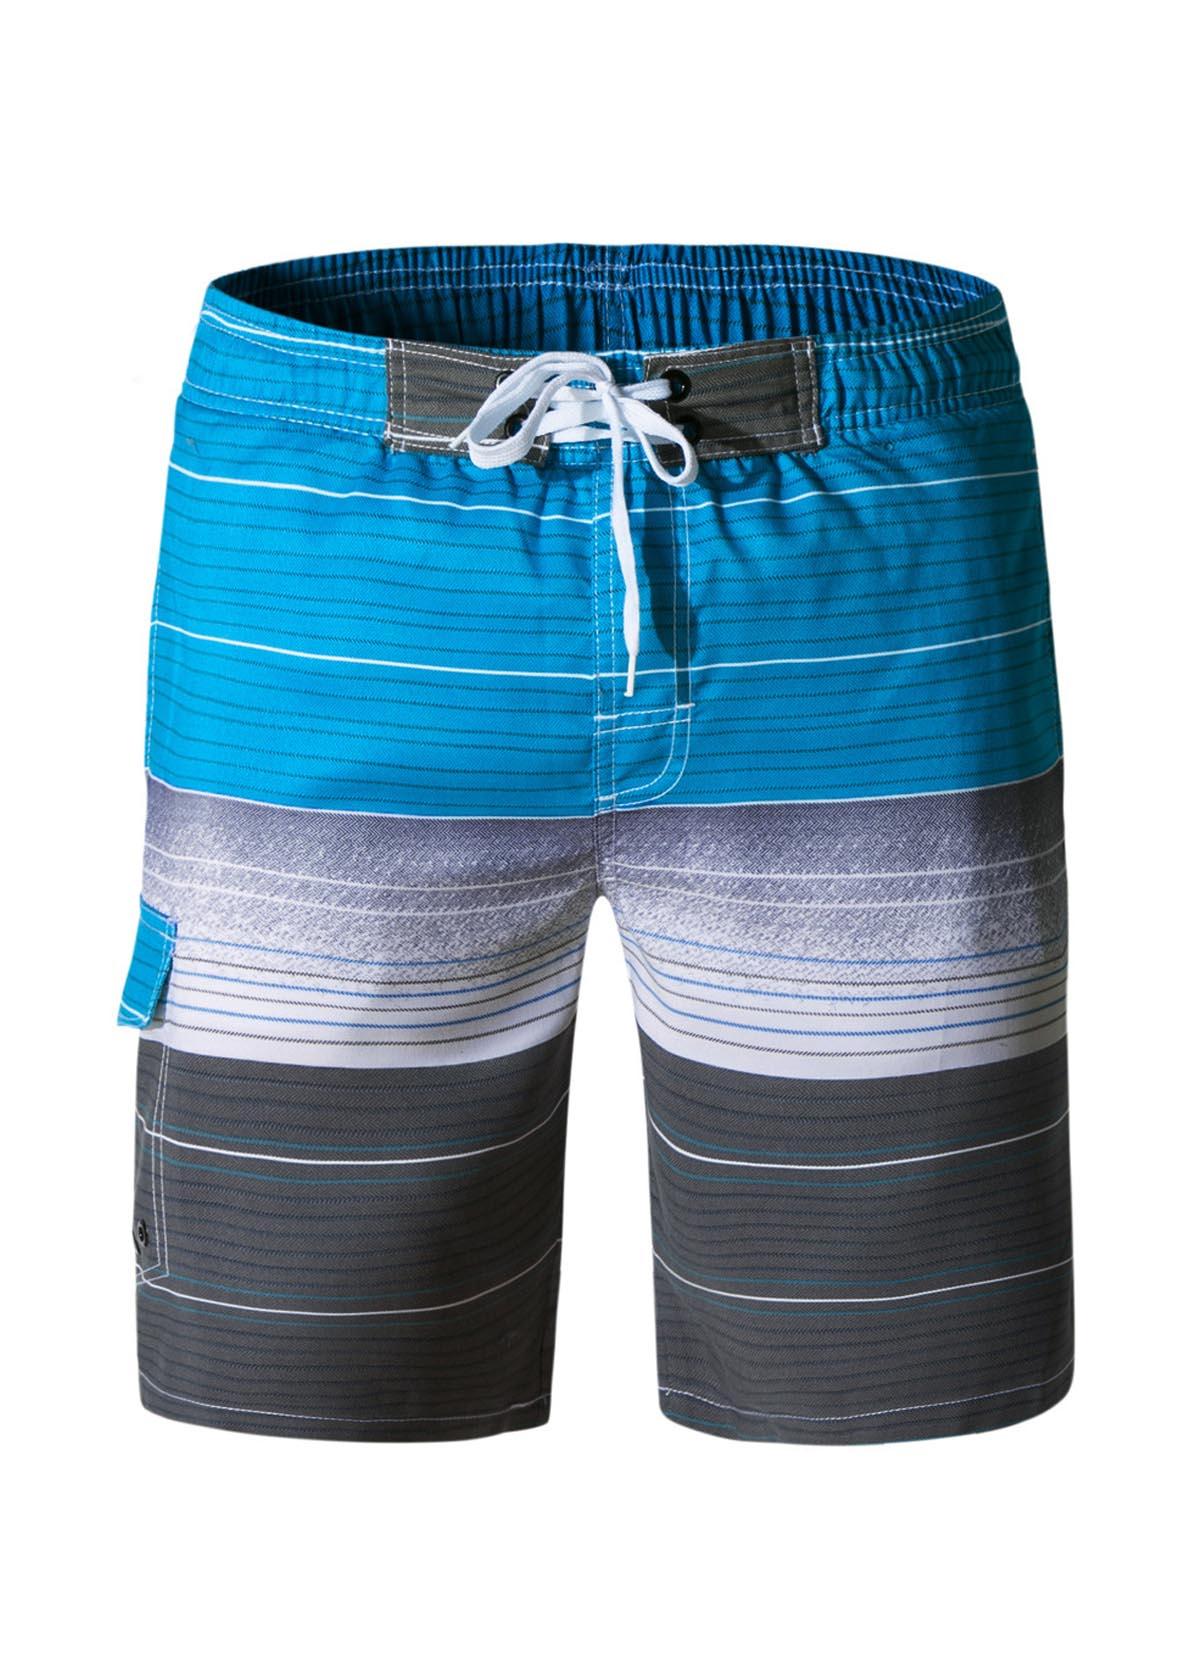 Bermuda Shorts Men's Quick Dry Gradient Stripe Beach Shorts with Mesh Lining